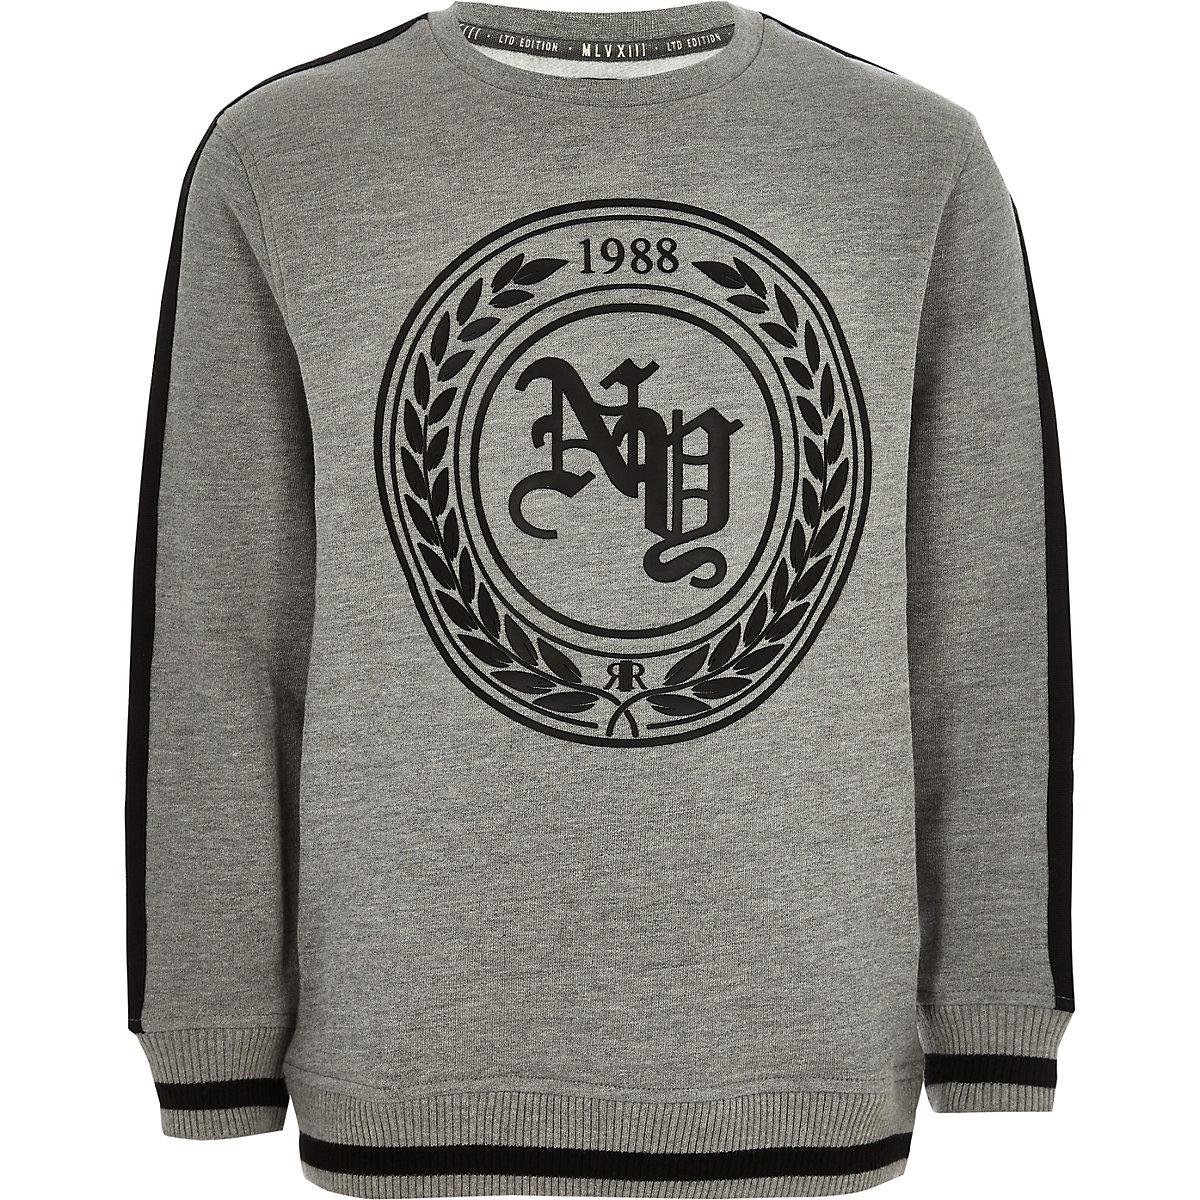 Graues Sweatshirt mit Print